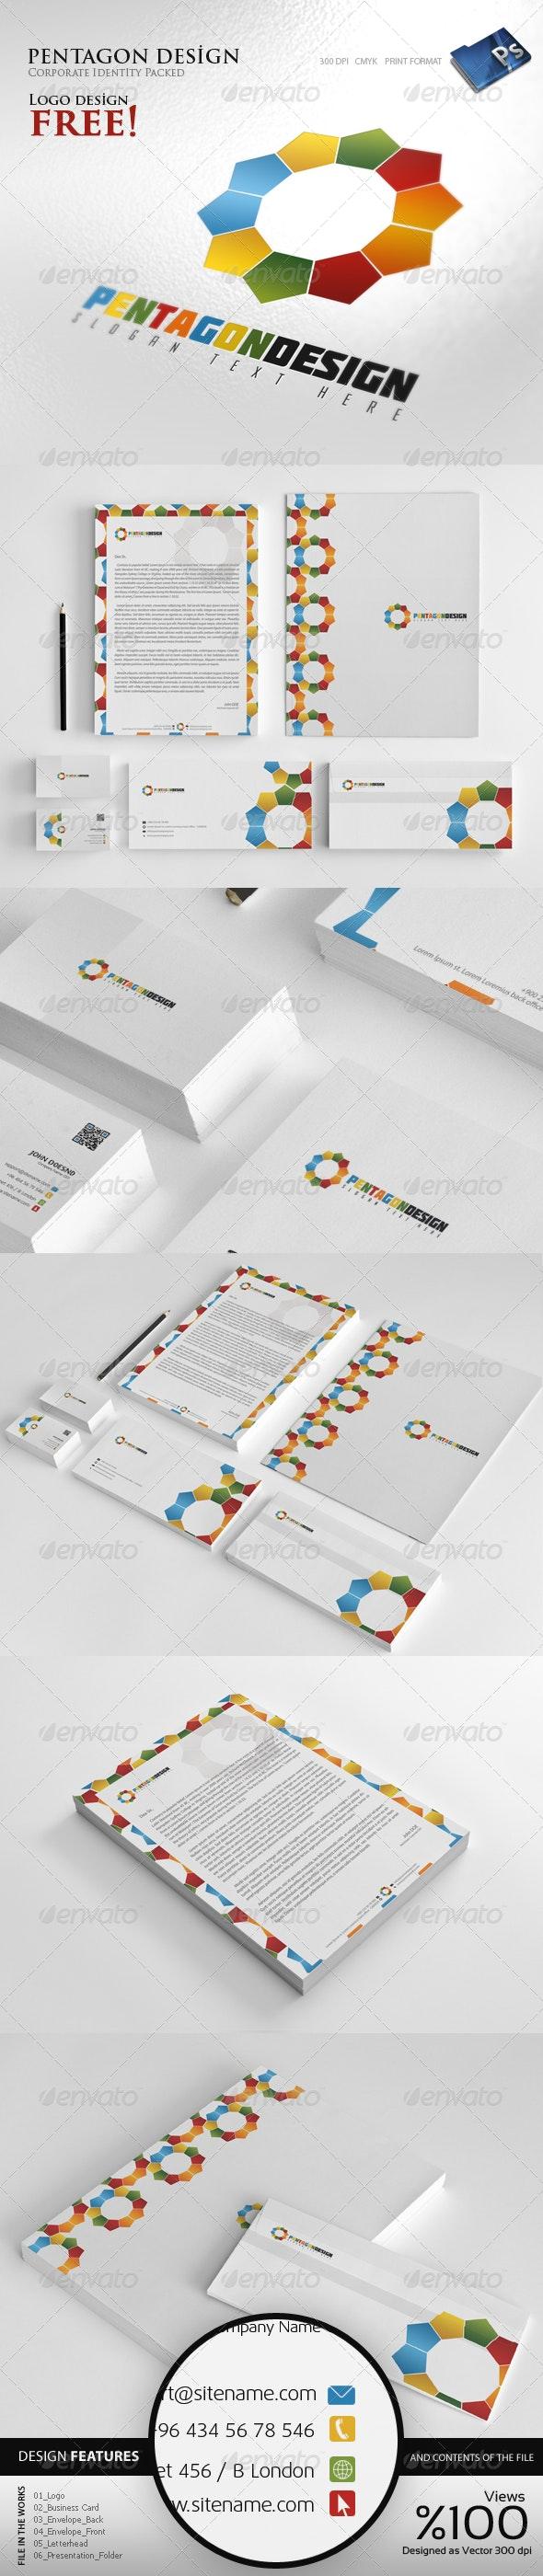 Pentagon Design - Corporate identity - Stationery Print Templates